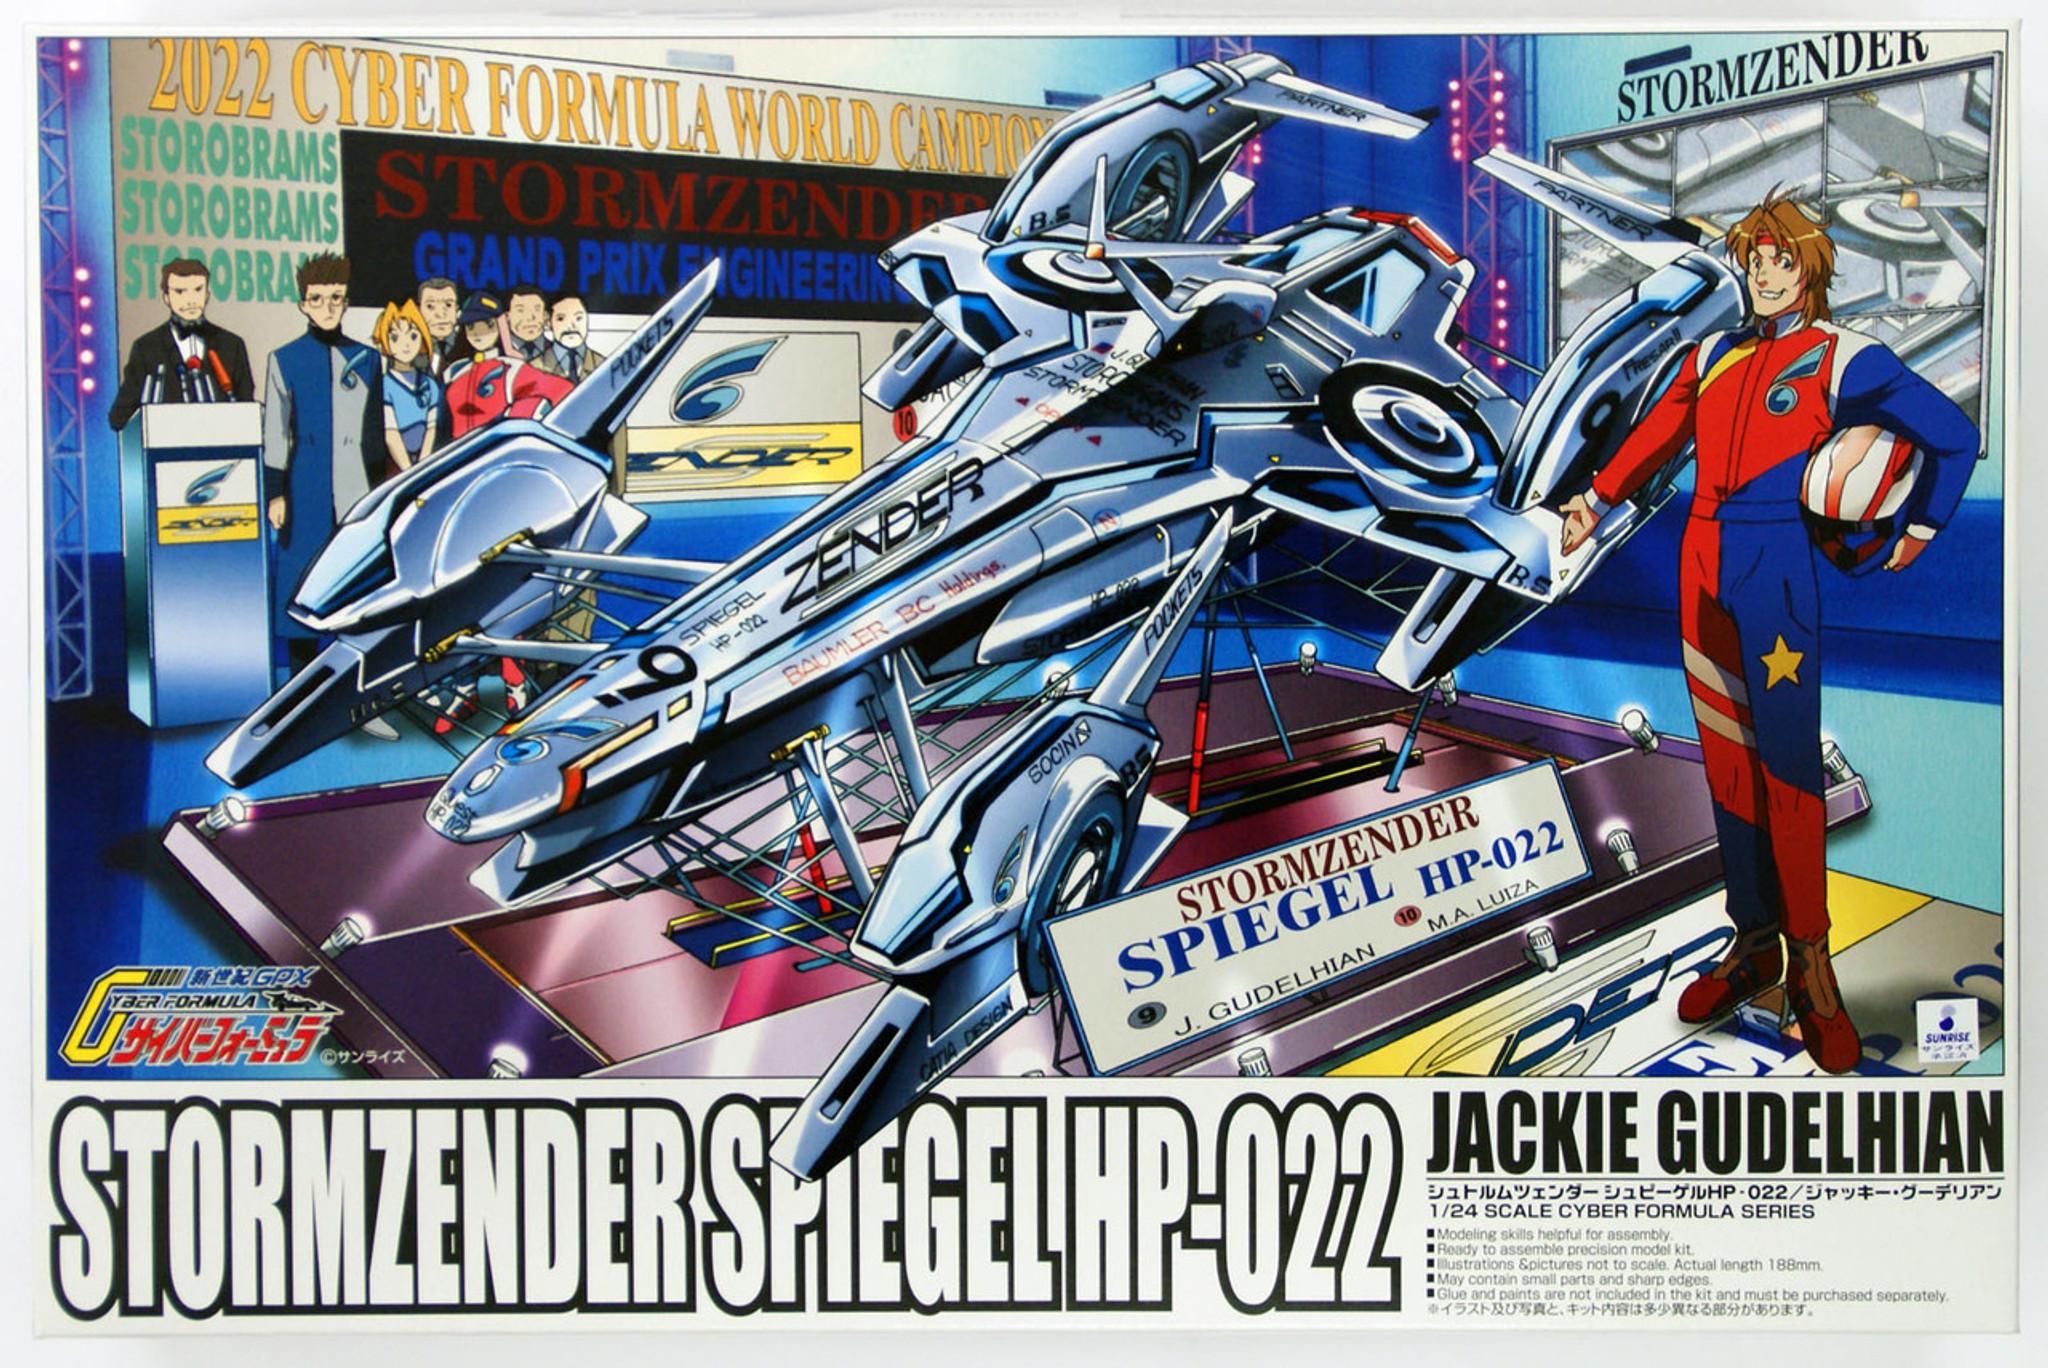 Aoshima 12314 Cyber Formula Stormzender Spiegel HP-022 Jackie ...